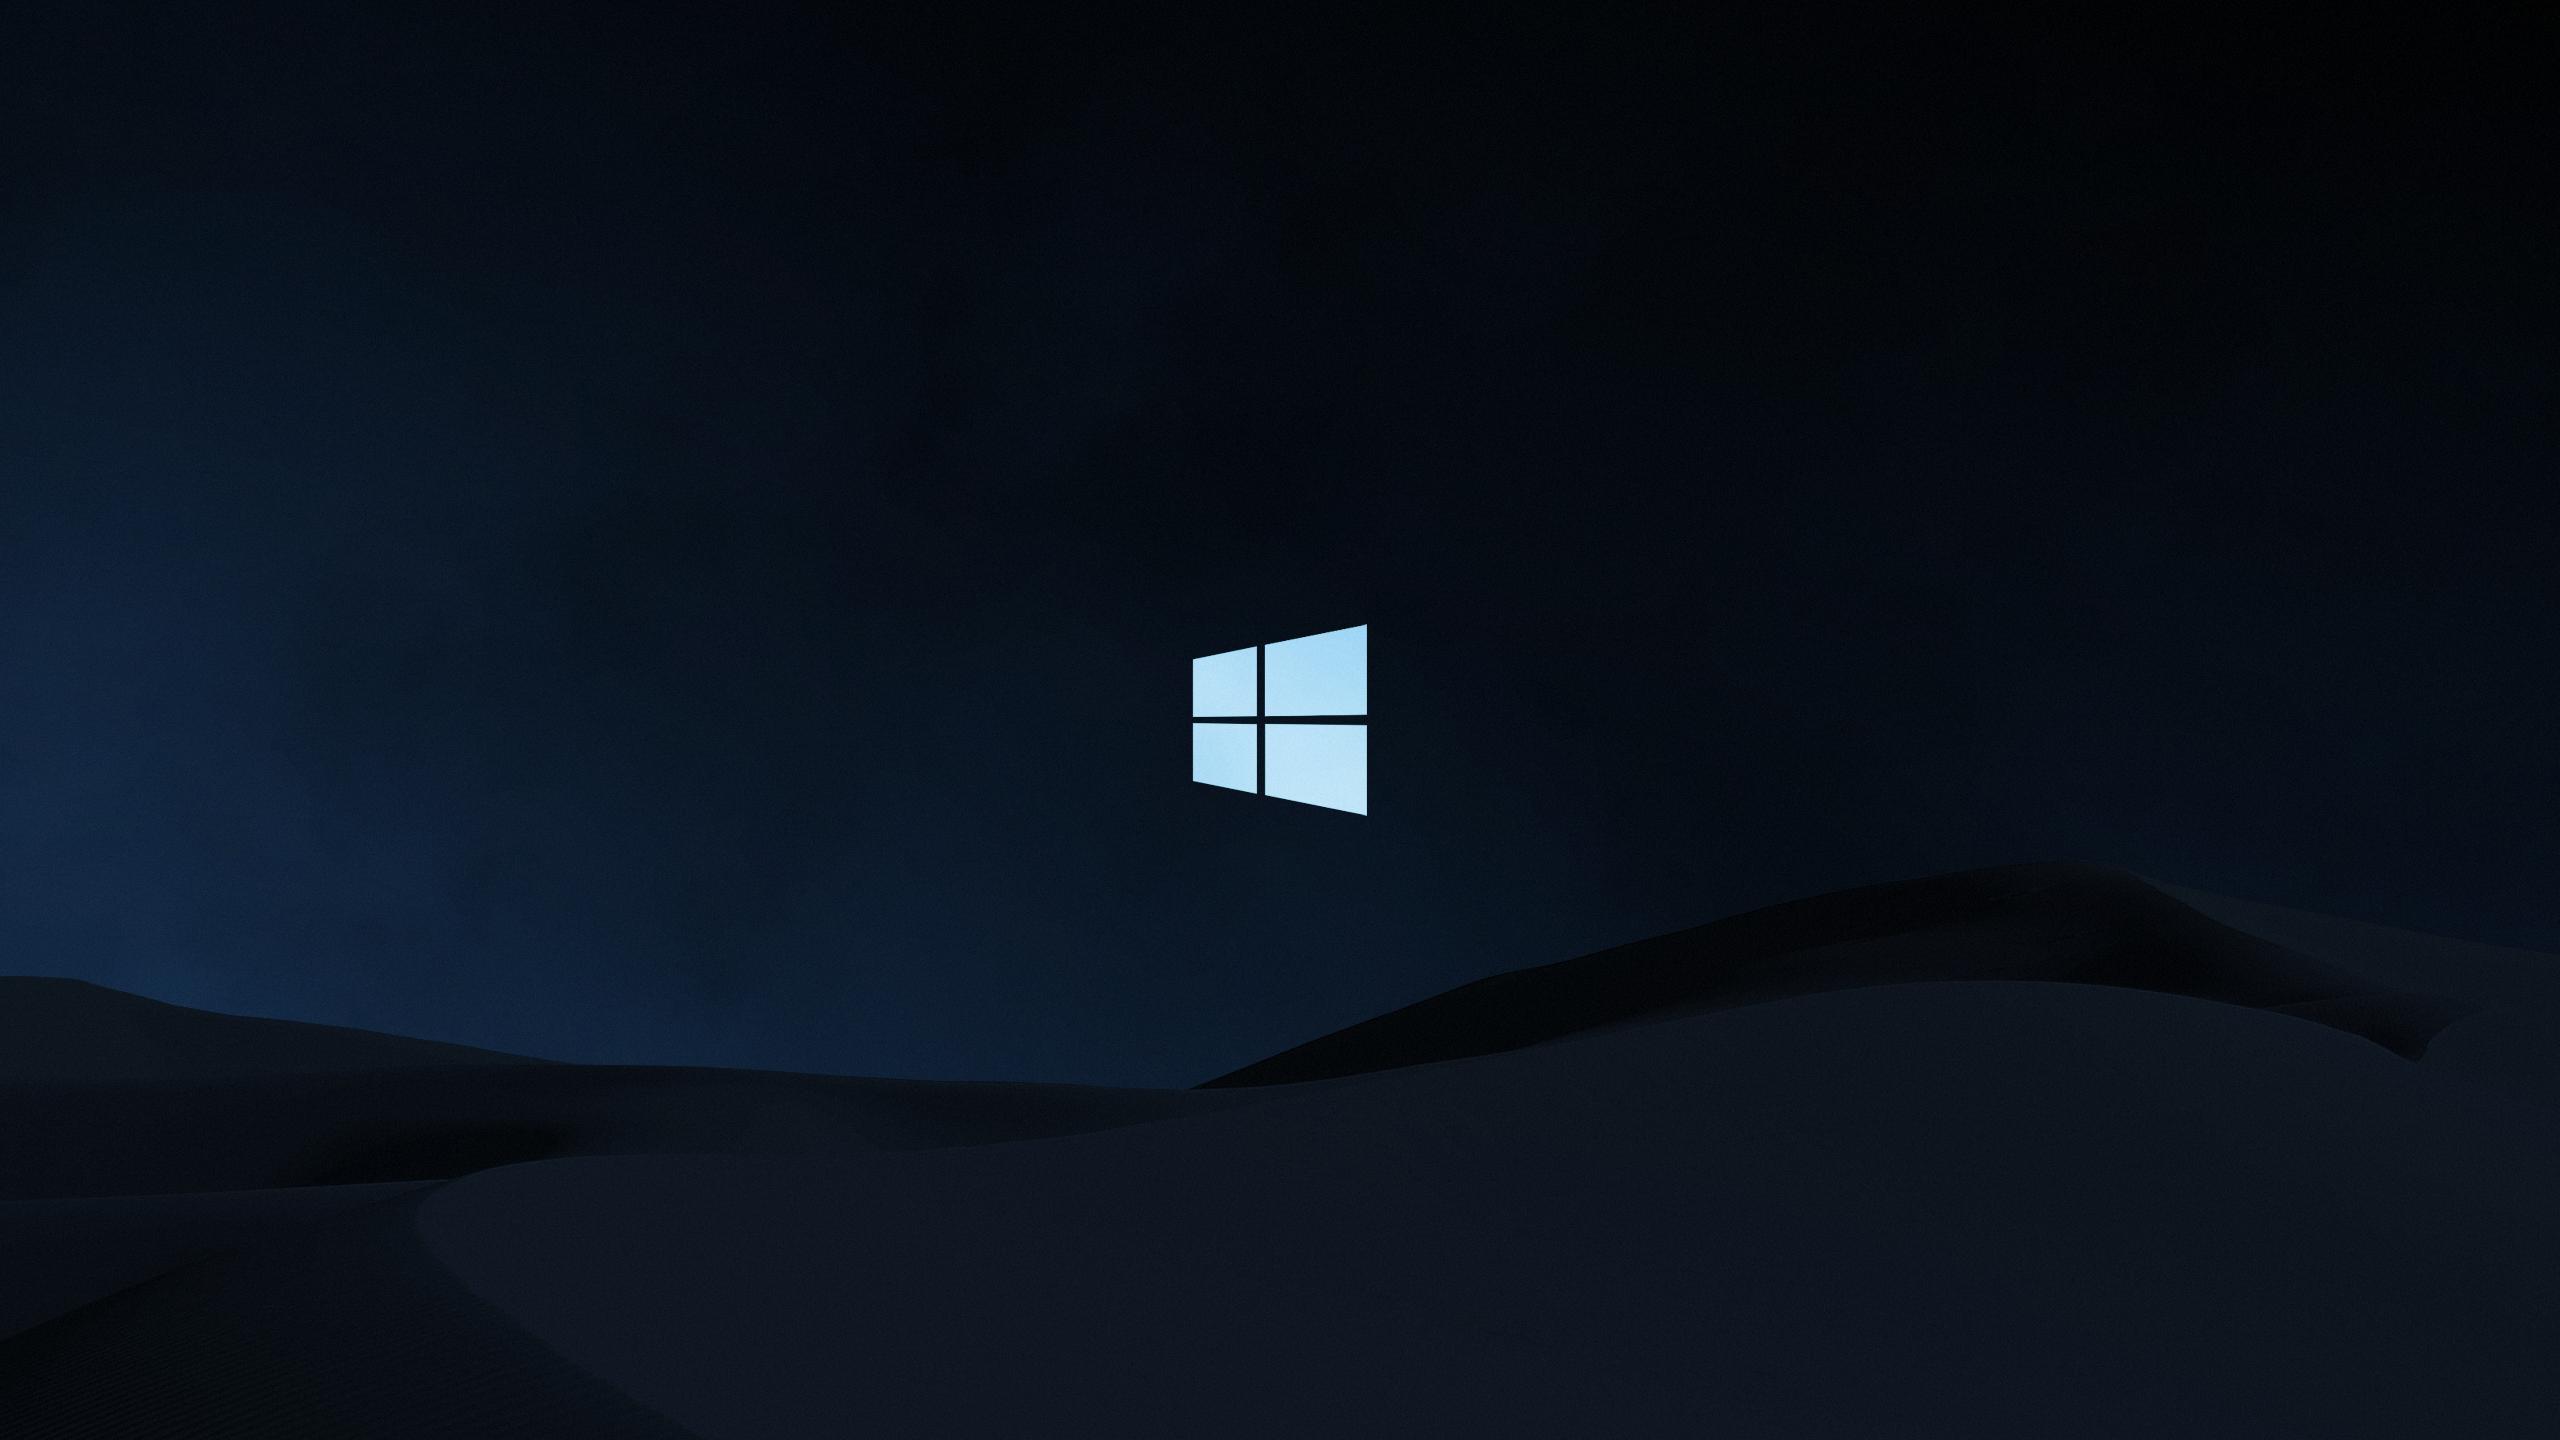 Clean Windows Background Desktop wallpaper art Computer 2560x1440